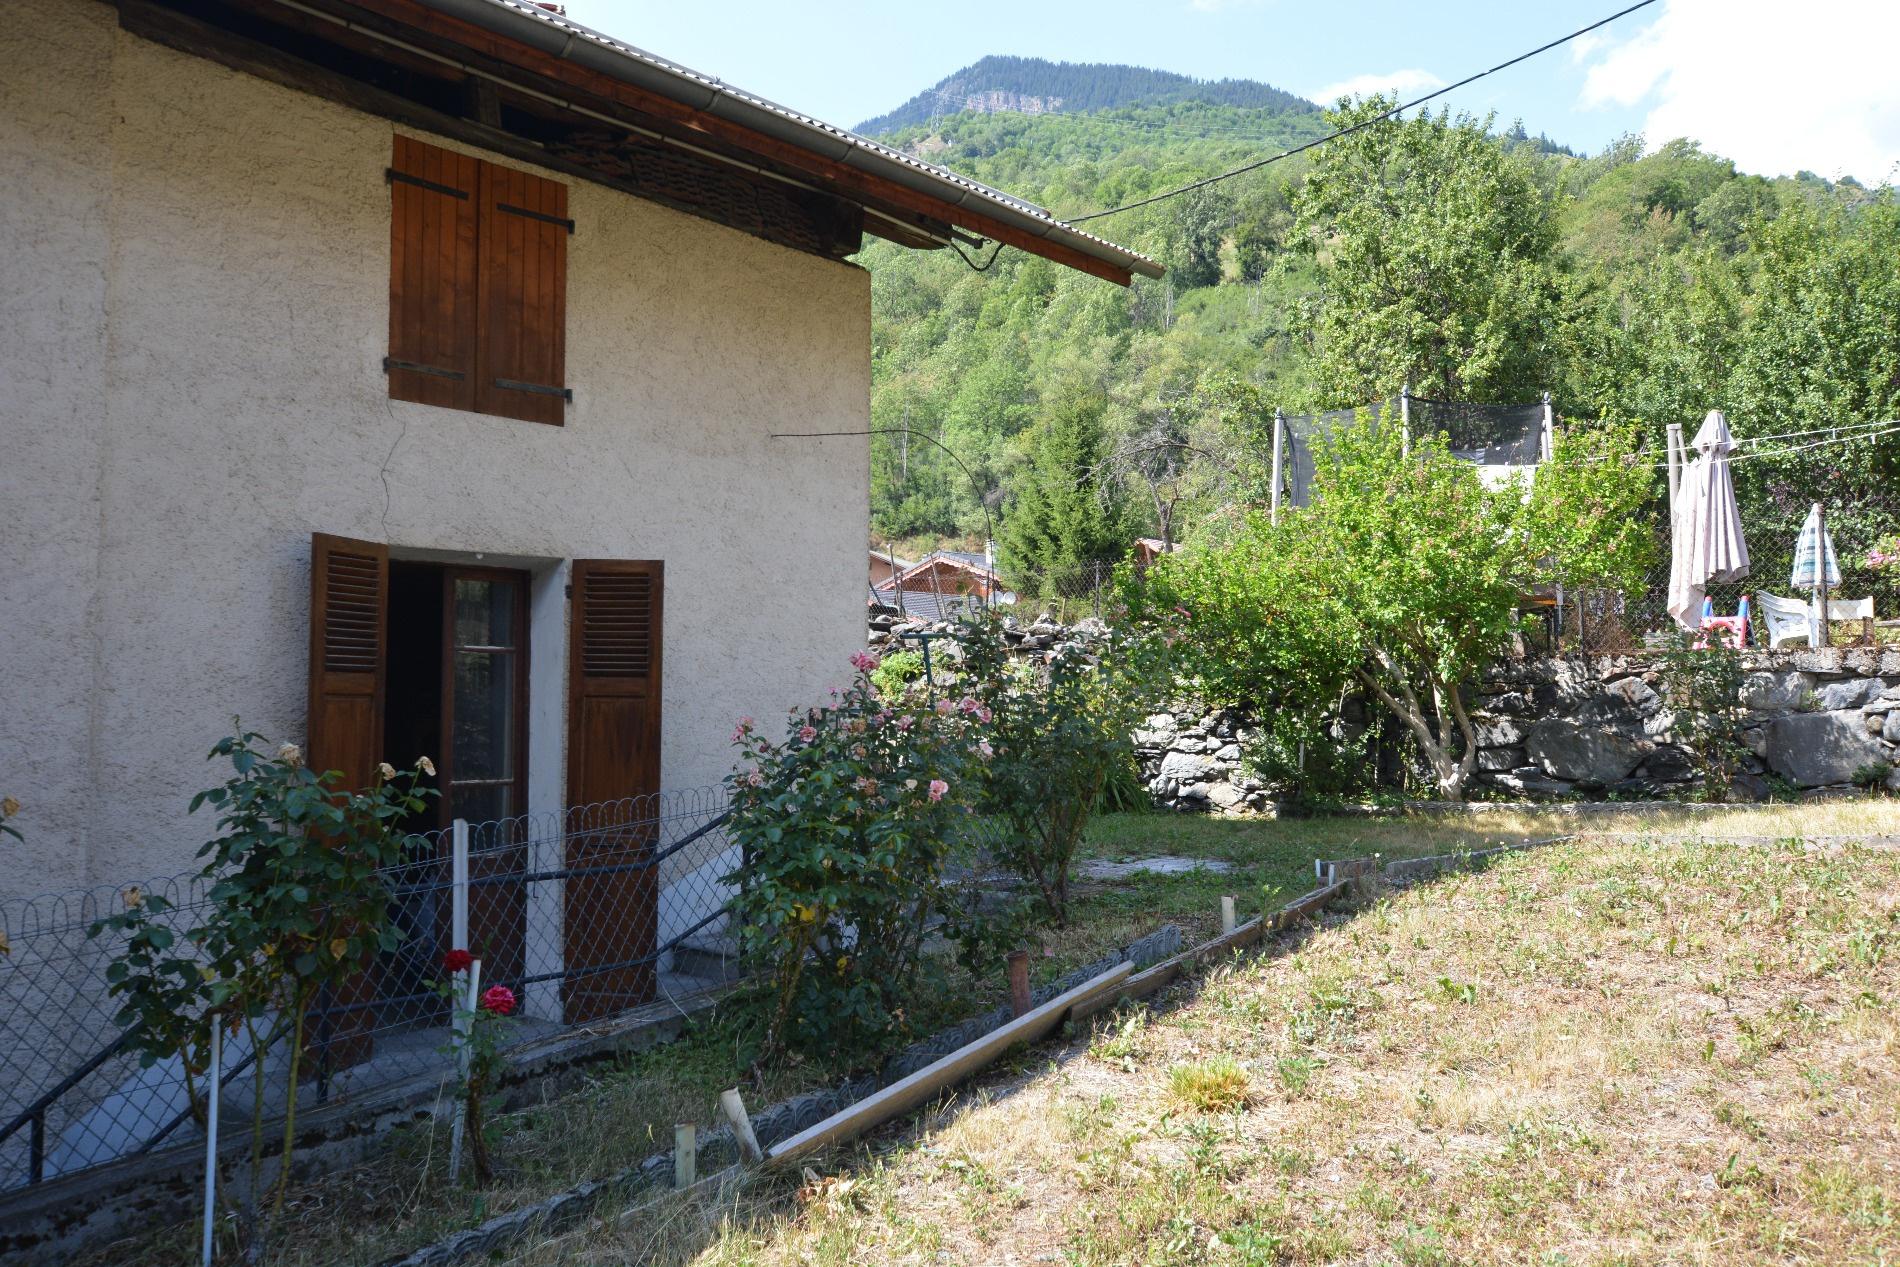 Vente a vendre maison avec grange r nover bozel for Acheter maison a renover